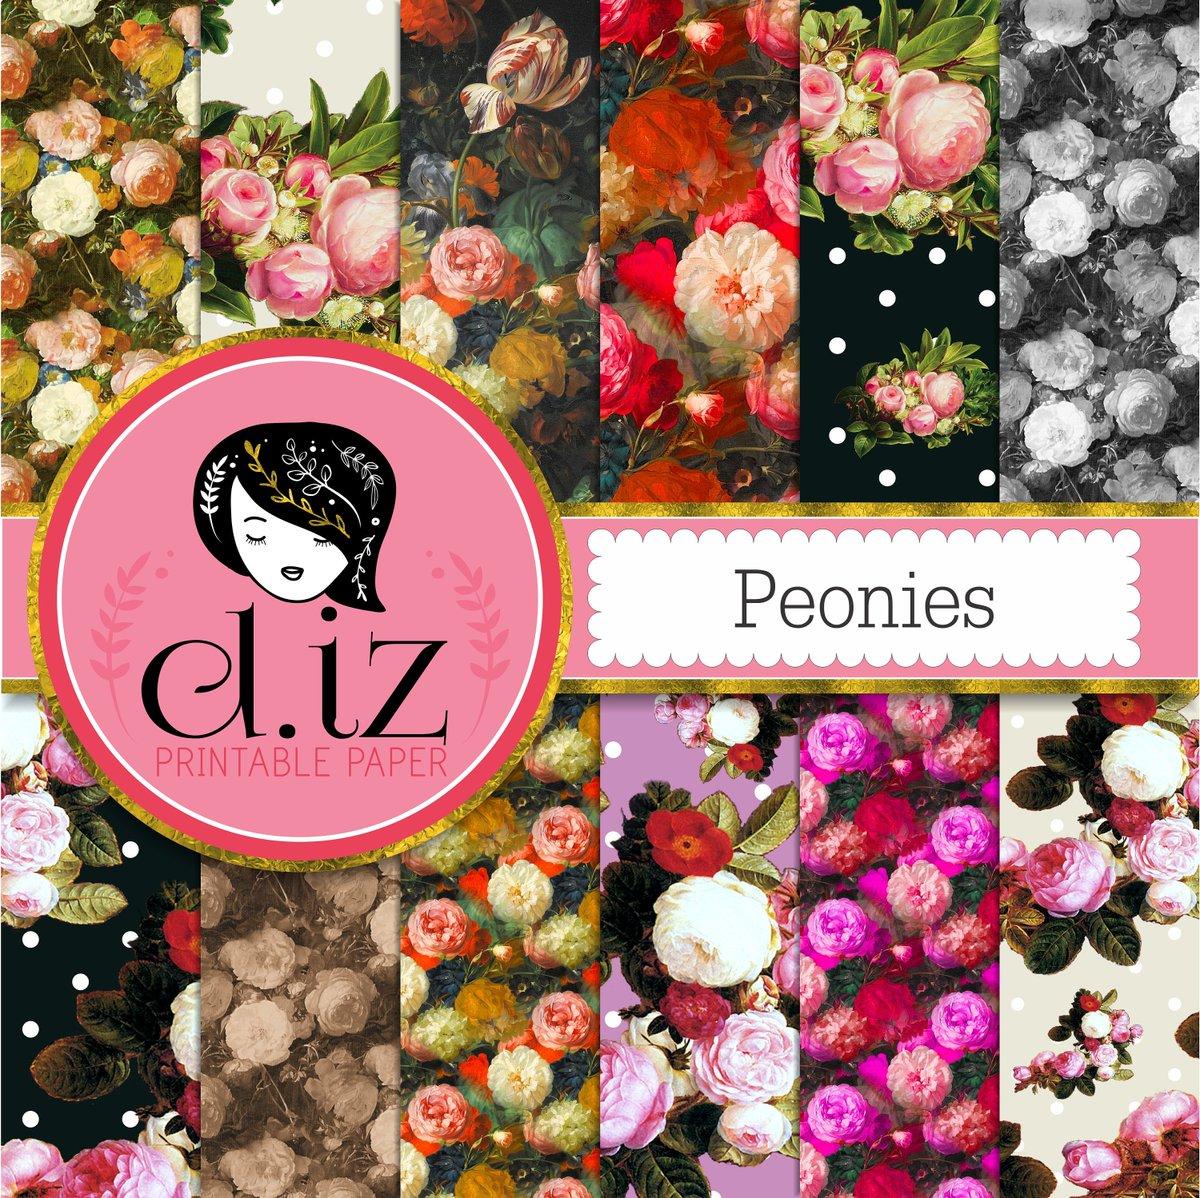 Diz On Twitter Floral Digital Paper Peonies Floral Scrapbook